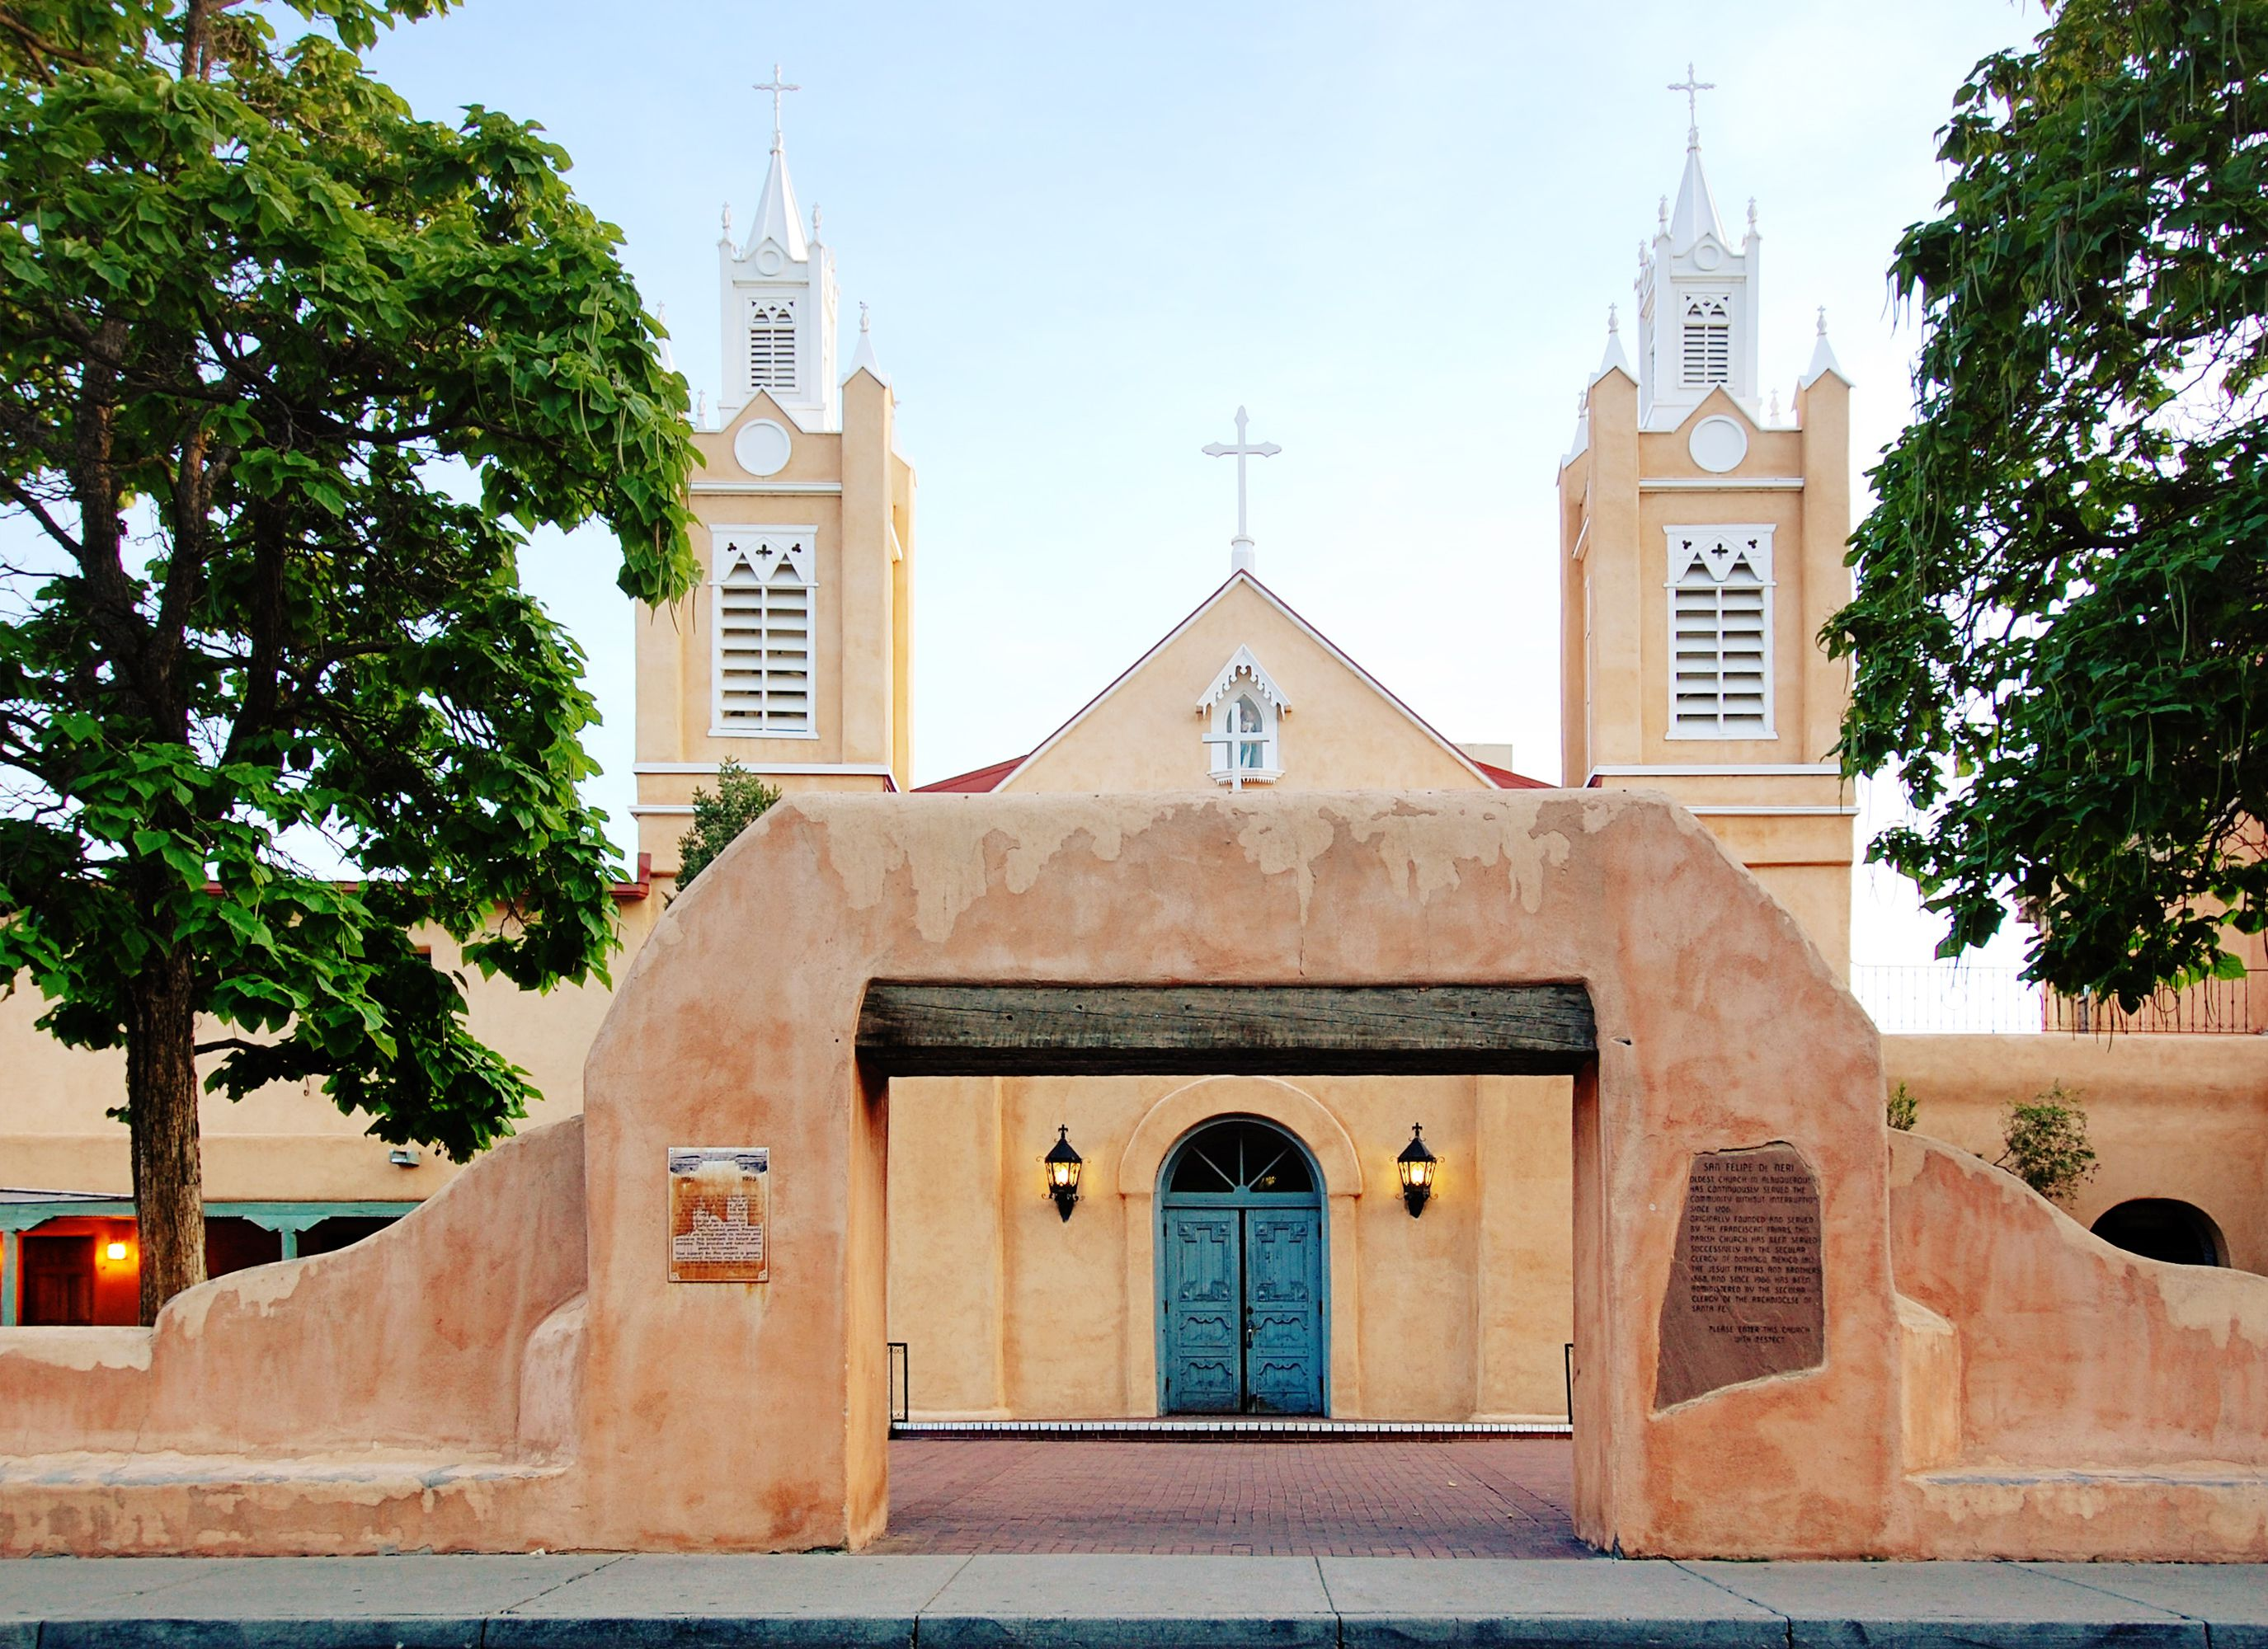 San Felipe de Neri Church in Albuquerque